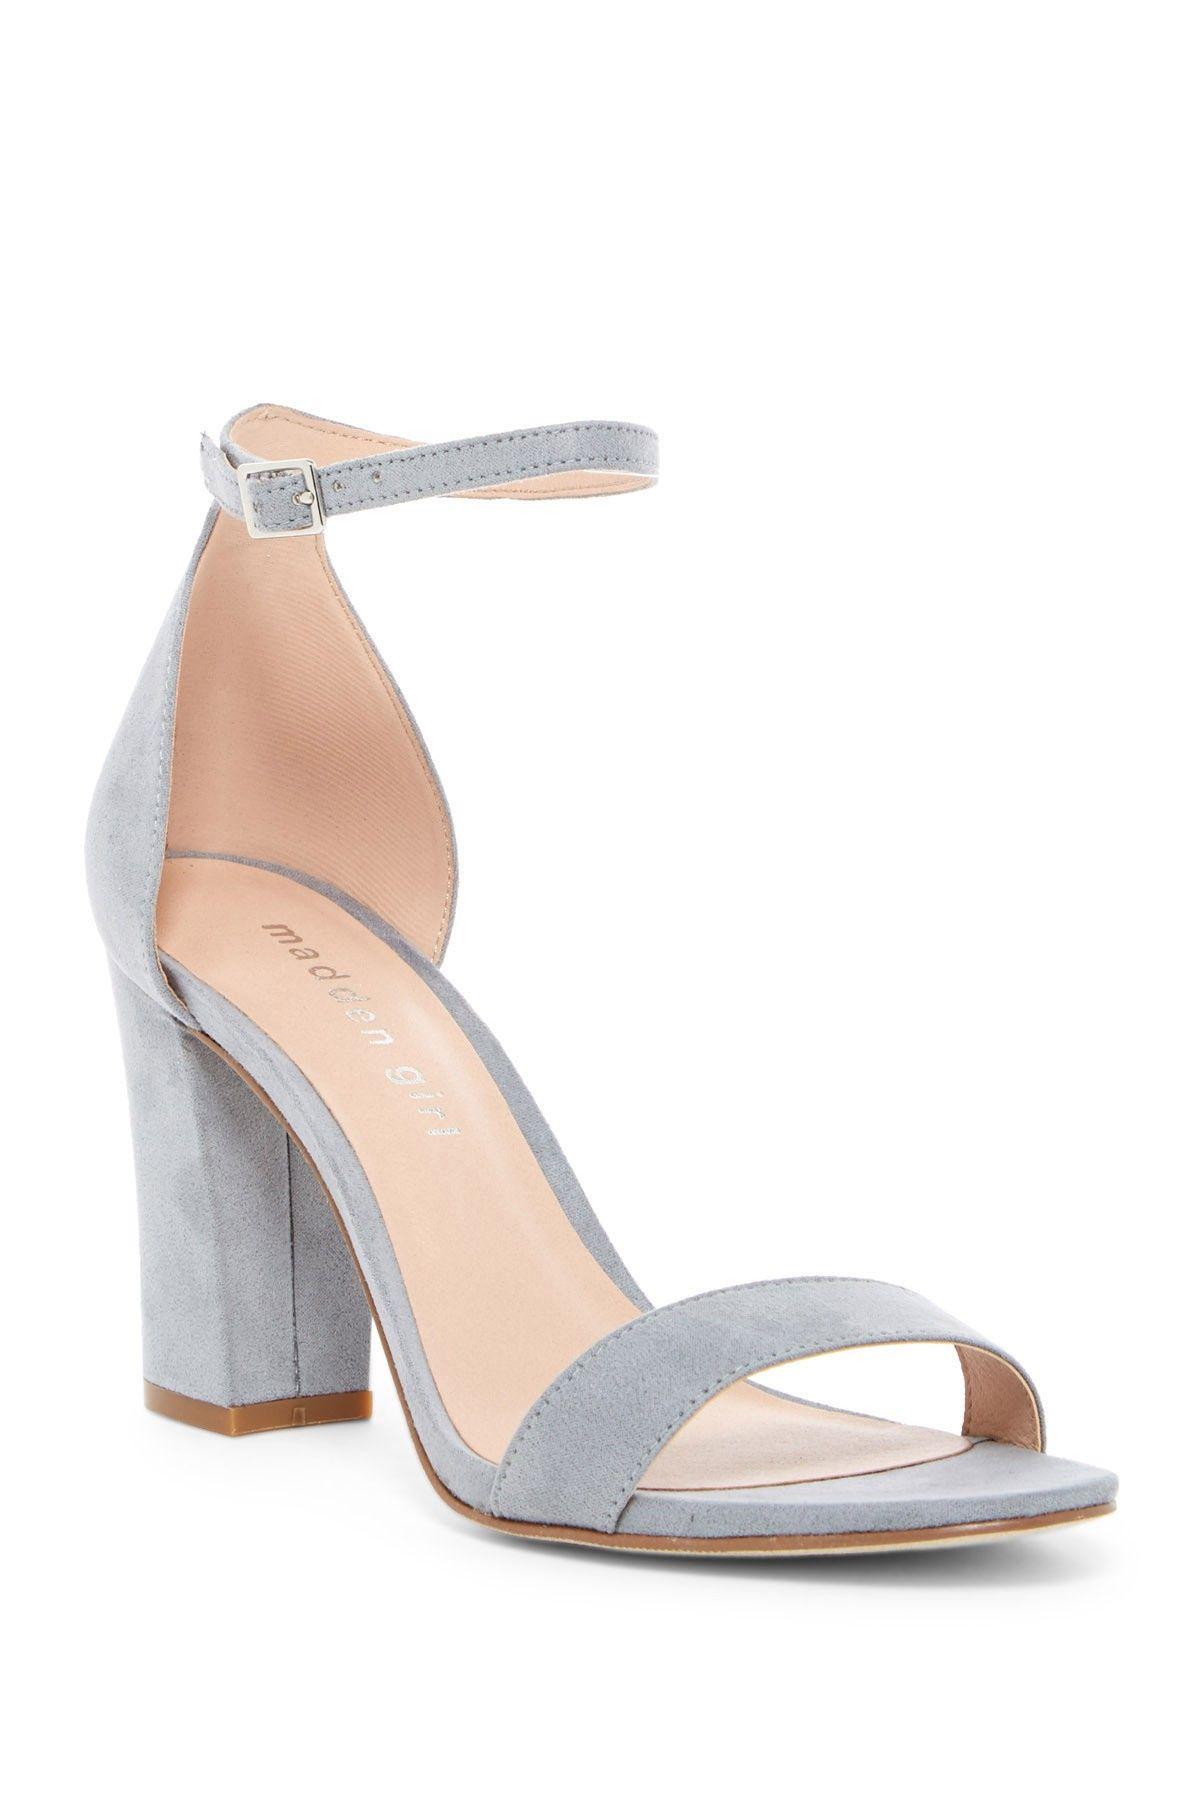 70835869a36 Beella Block Heel Sandal Blue Sandals